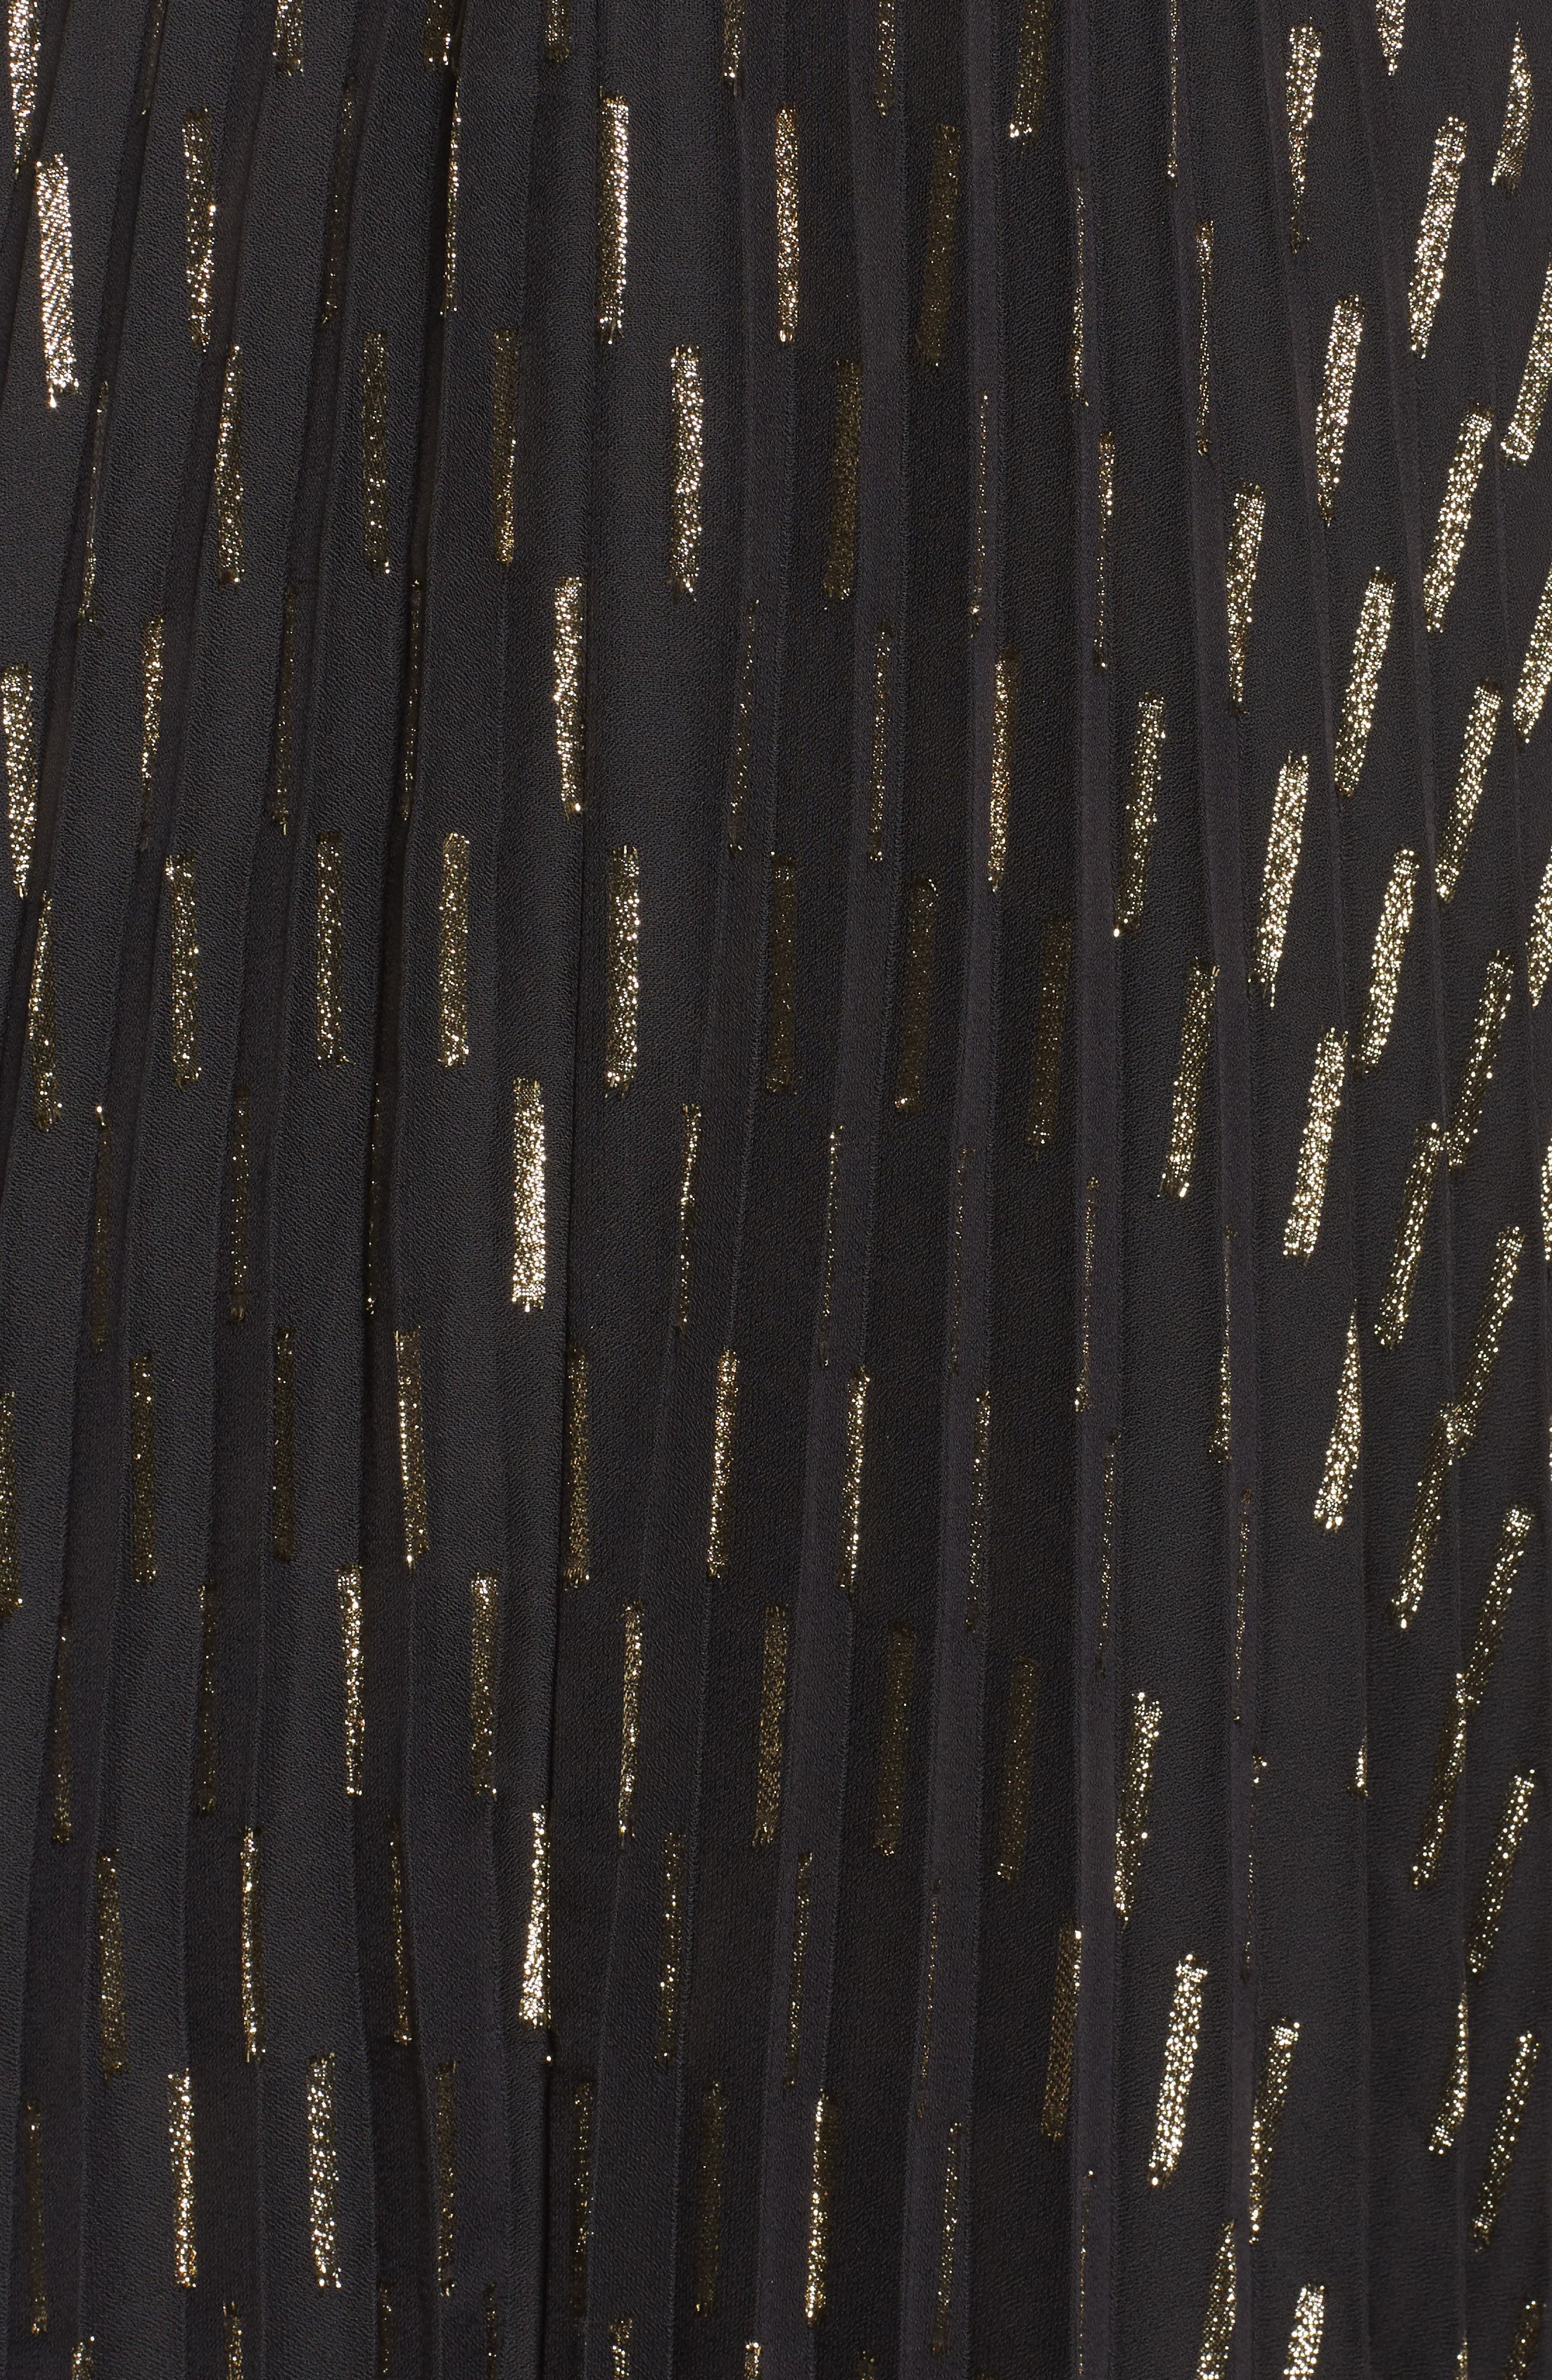 Metallic Detail Pleated Chiffon Maxi Skirt,                             Alternate thumbnail 5, color,                             712